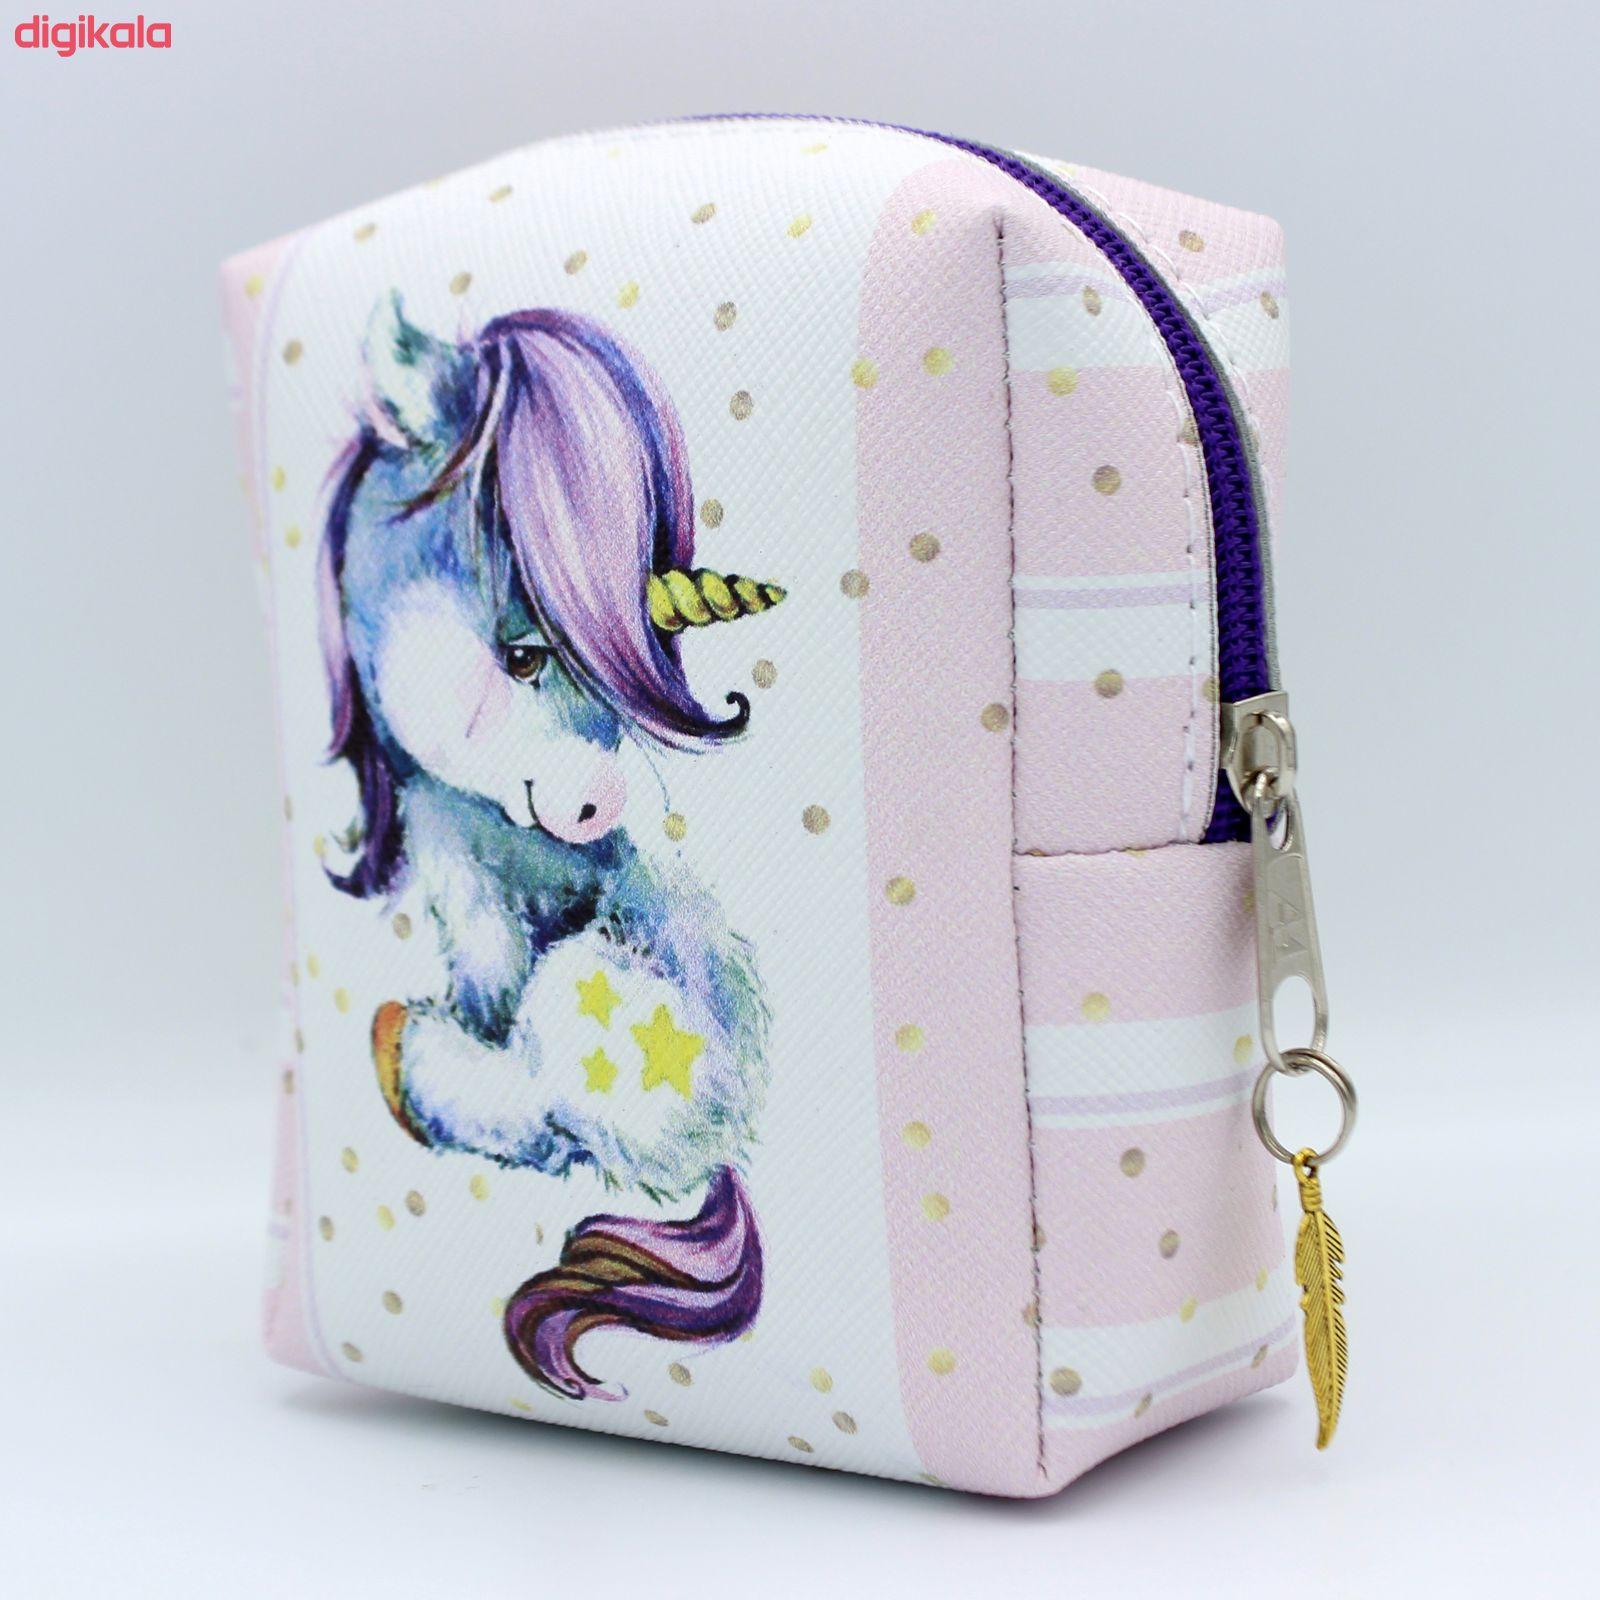 کیف نوار بهداشتی طرح اسب تک شاخ کد A037